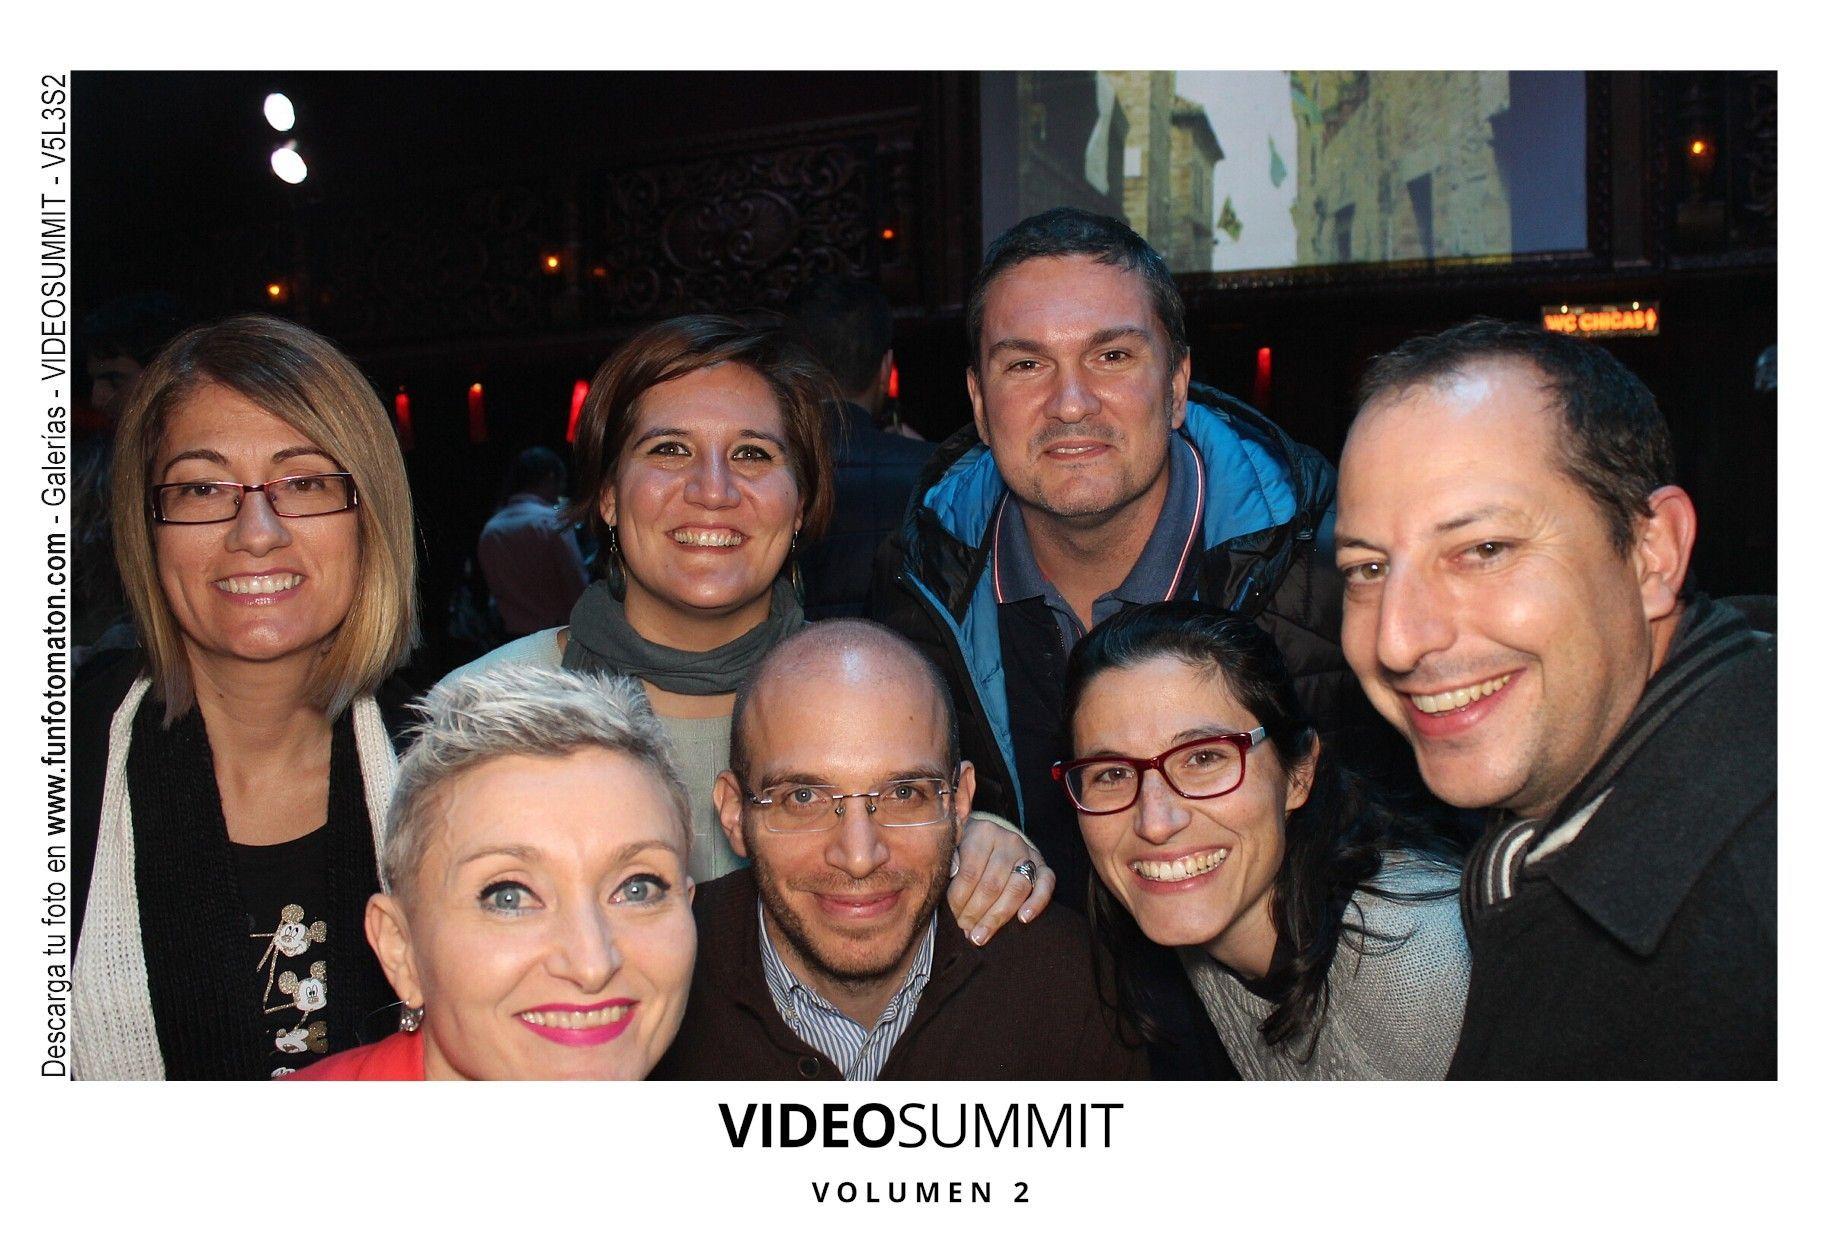 videosummit-vol2-club-party-046